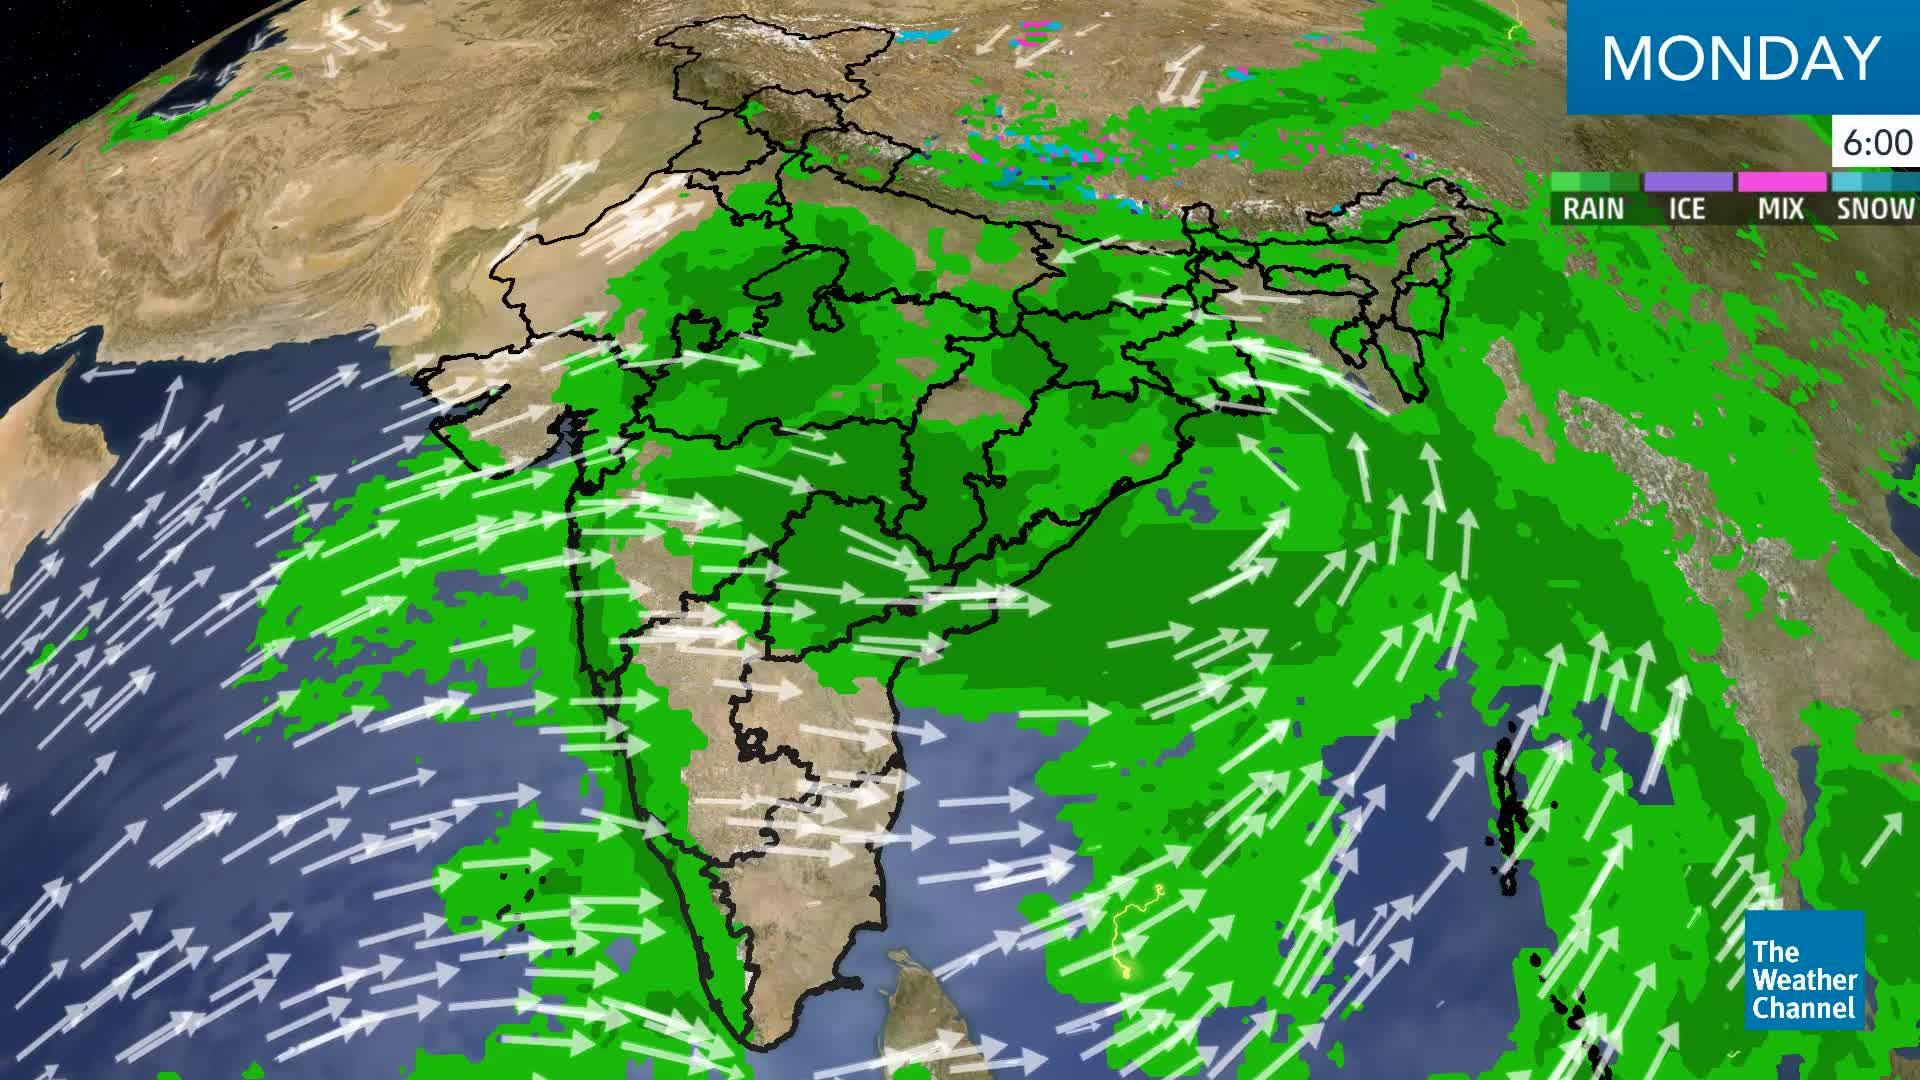 Flood Alert for Odisha, Andhra Pradesh Over Next Two Days